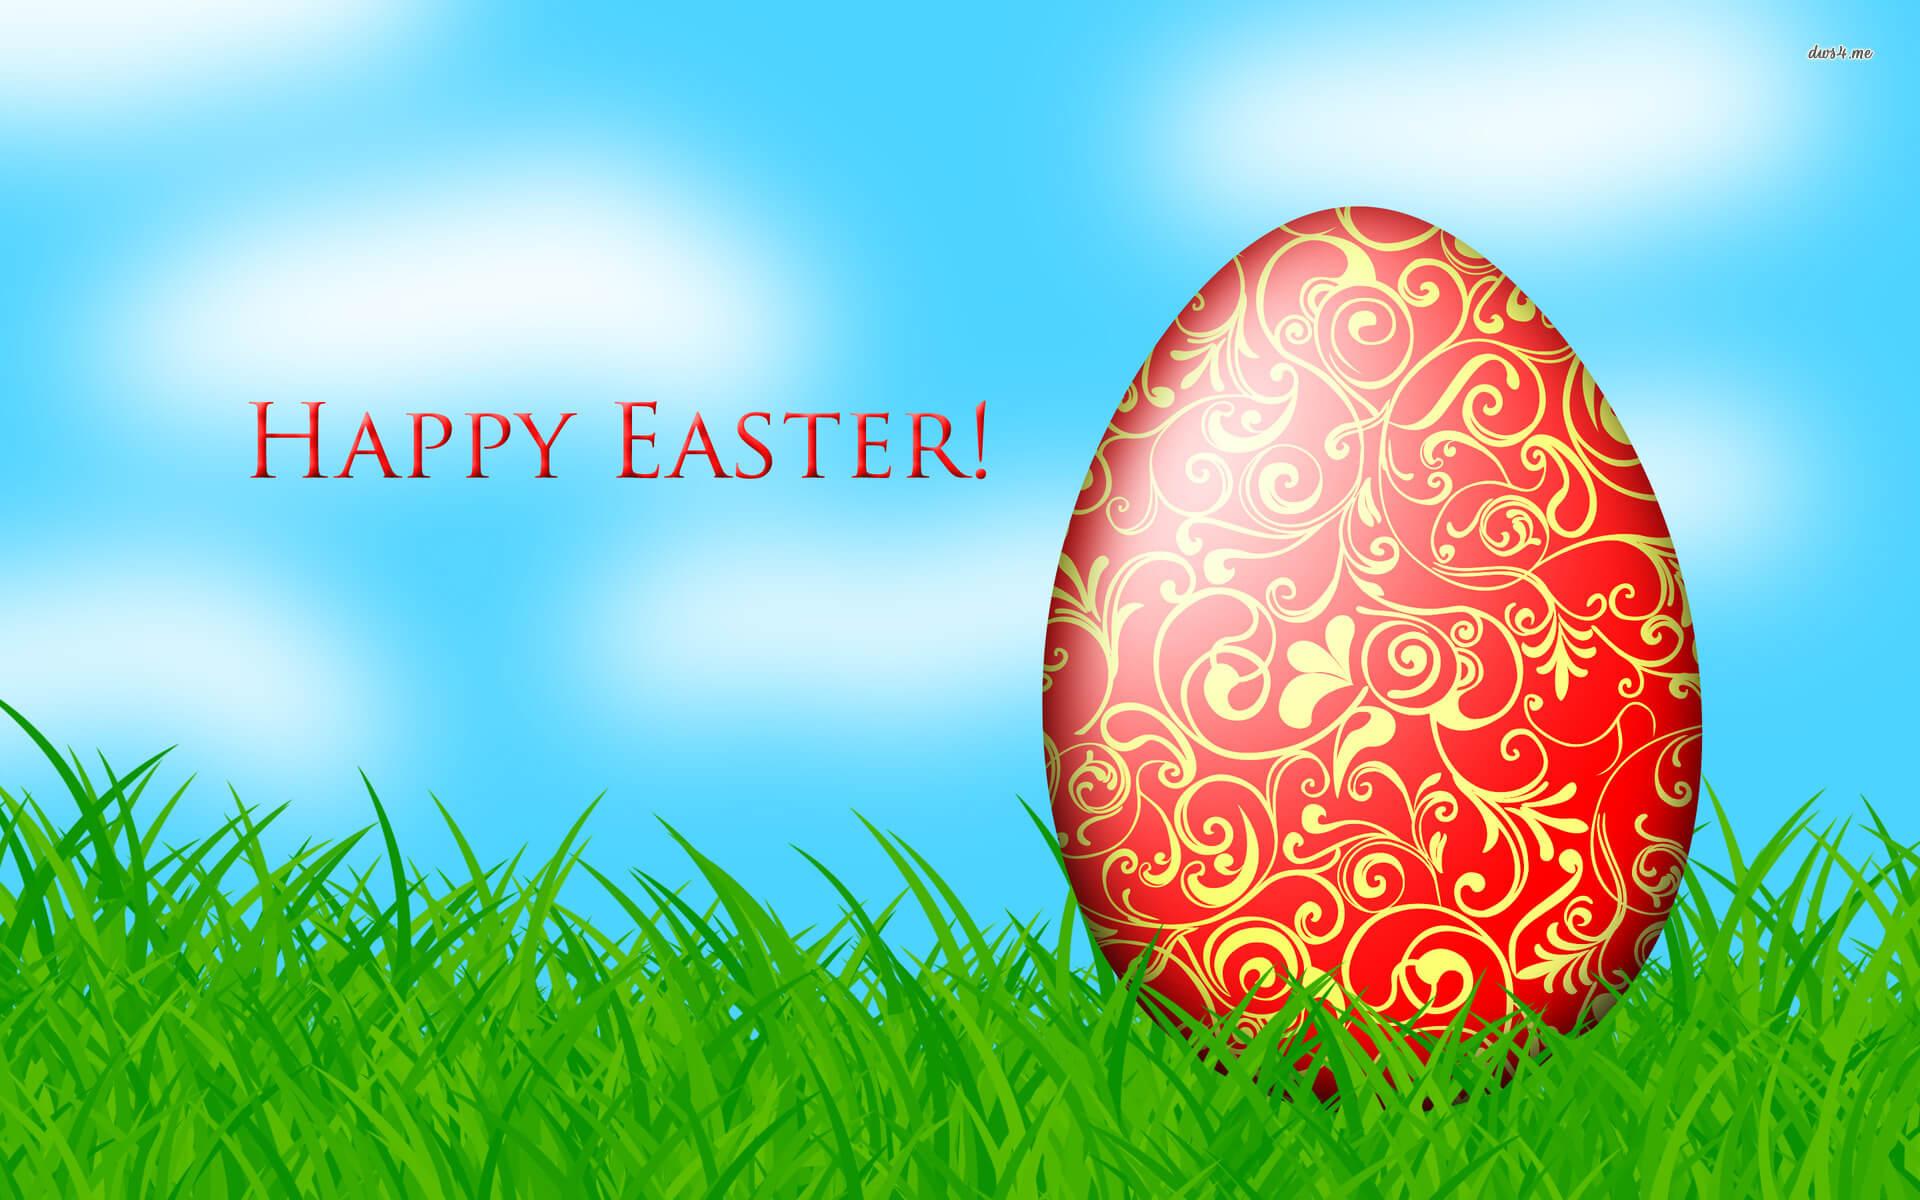 happy easter egg art wallpaper hd background